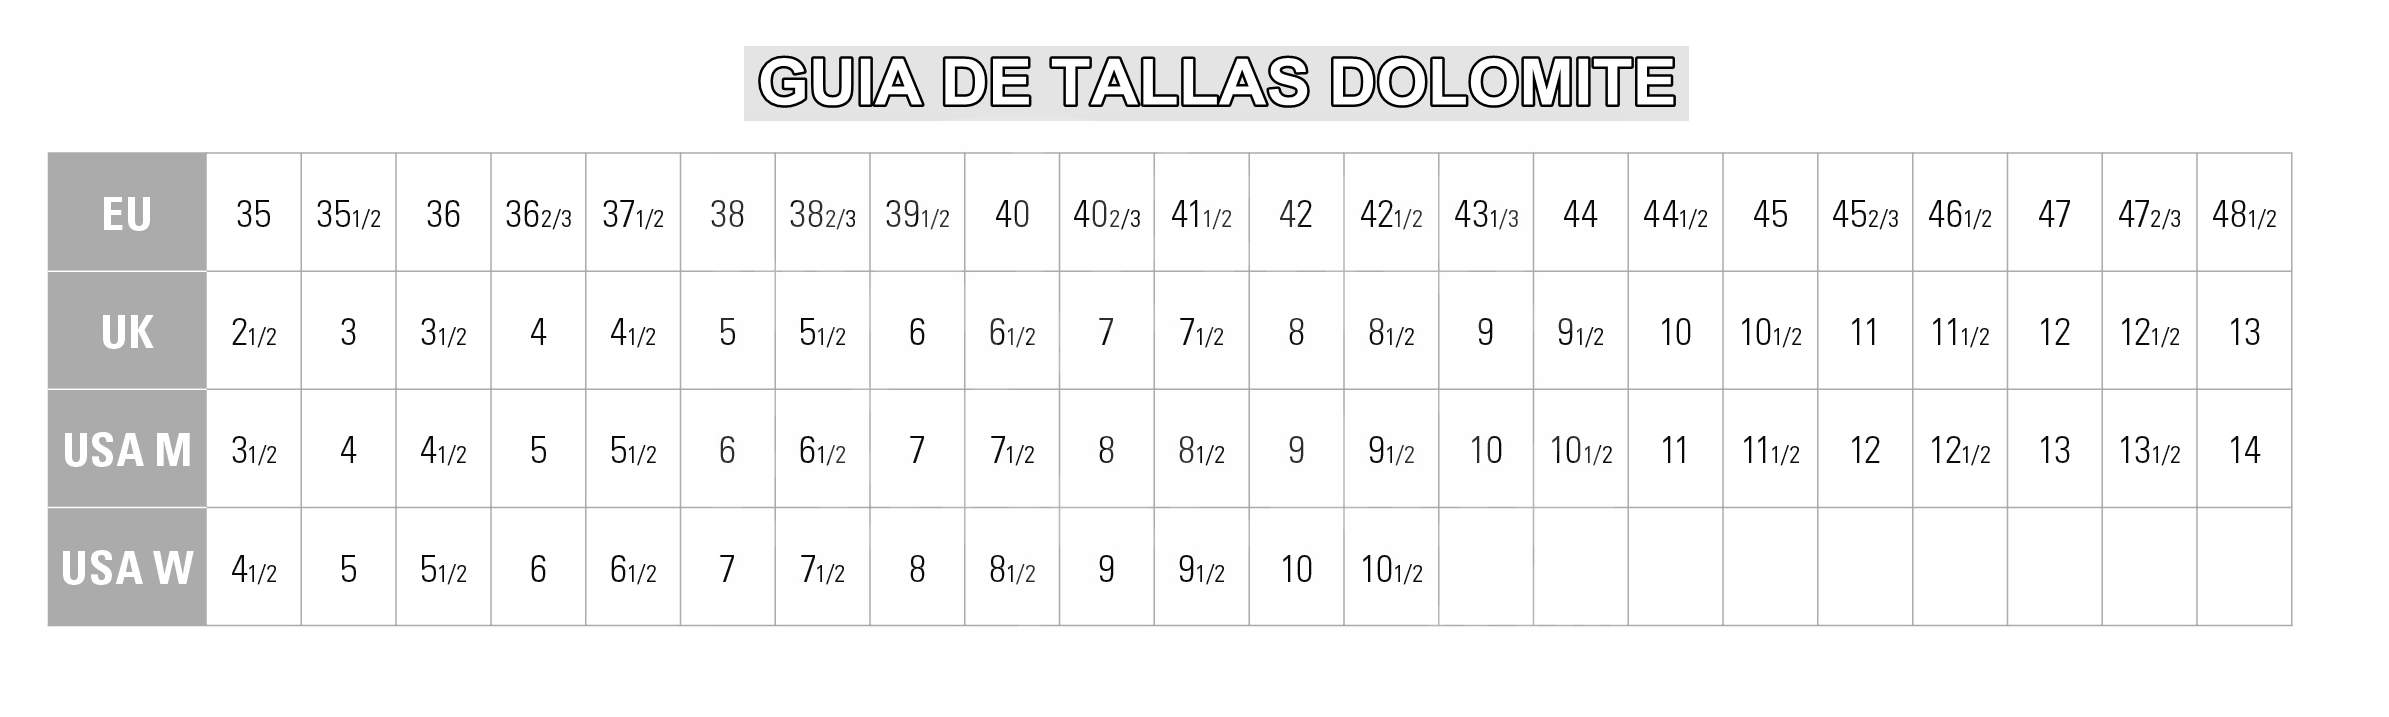 GUIA DE TALLAS DOLOMITE